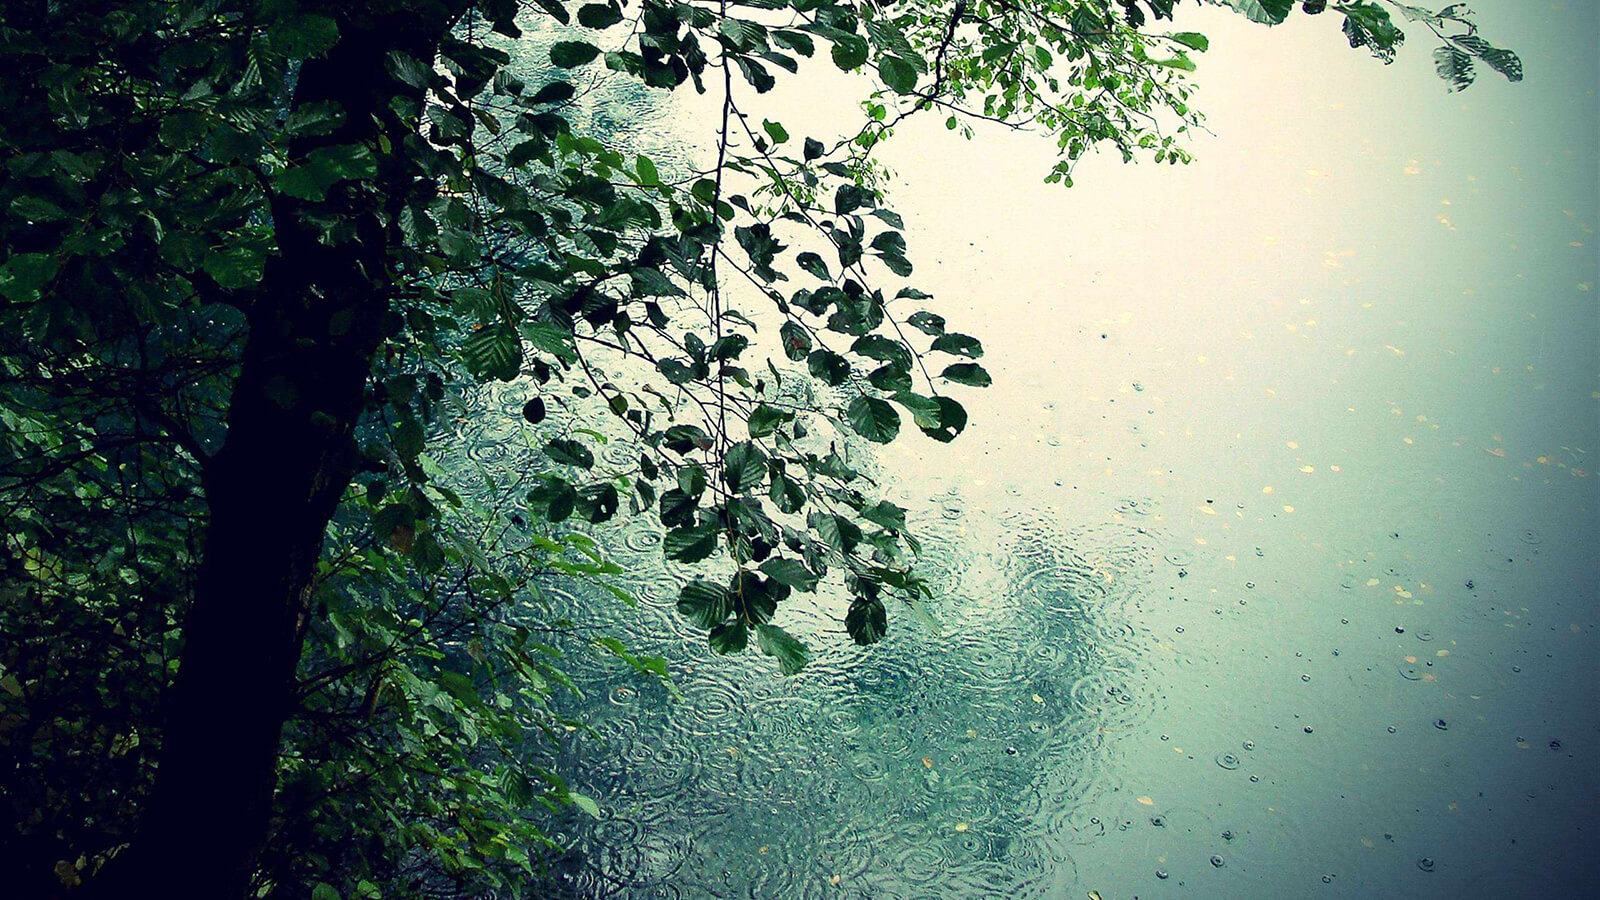 rainproof_04